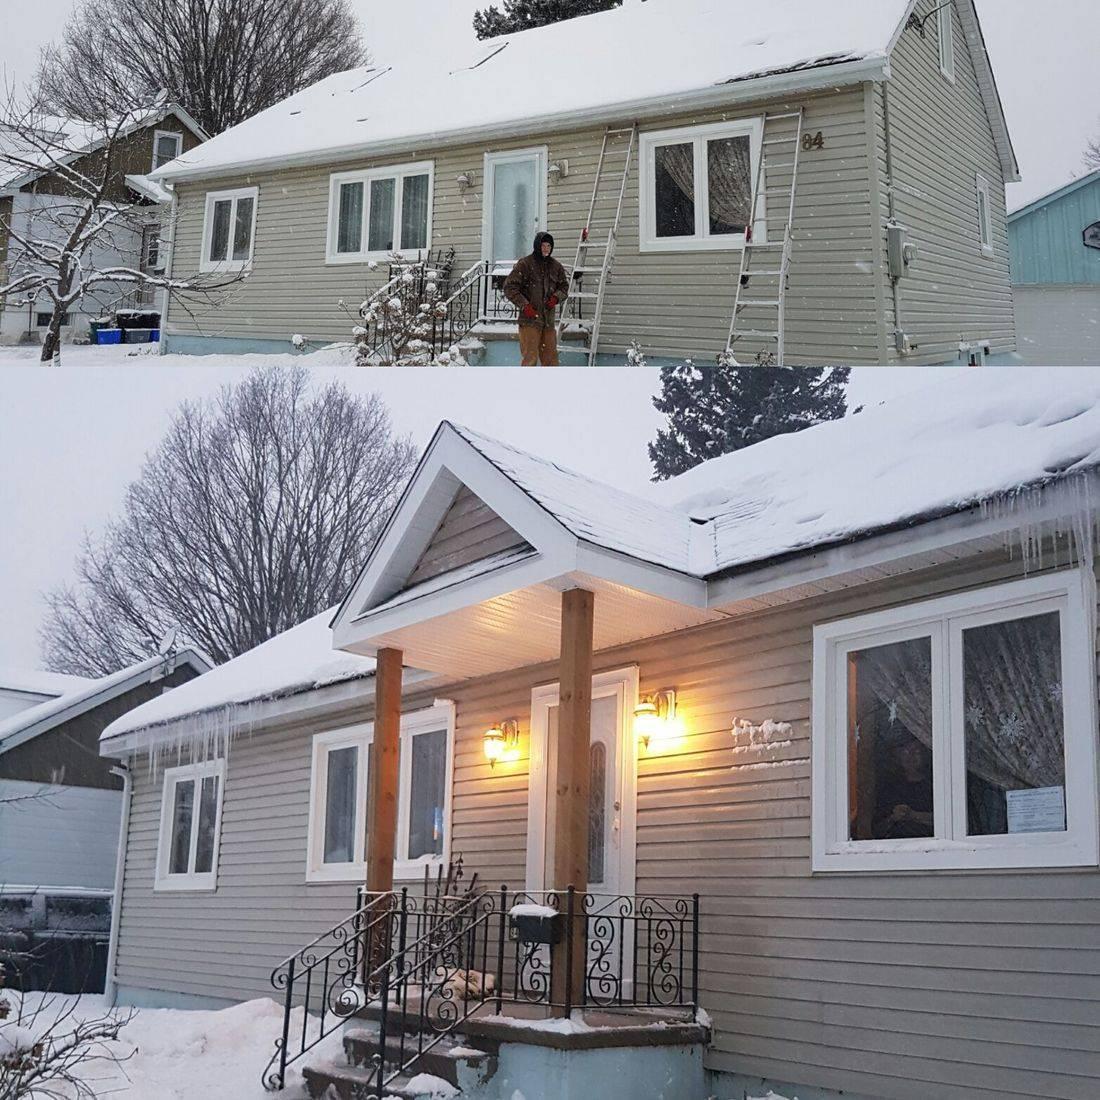 Exterior Renovations, Contractor, Muskoka, Carpenter, Siding, Roofing, Decks, Veranda